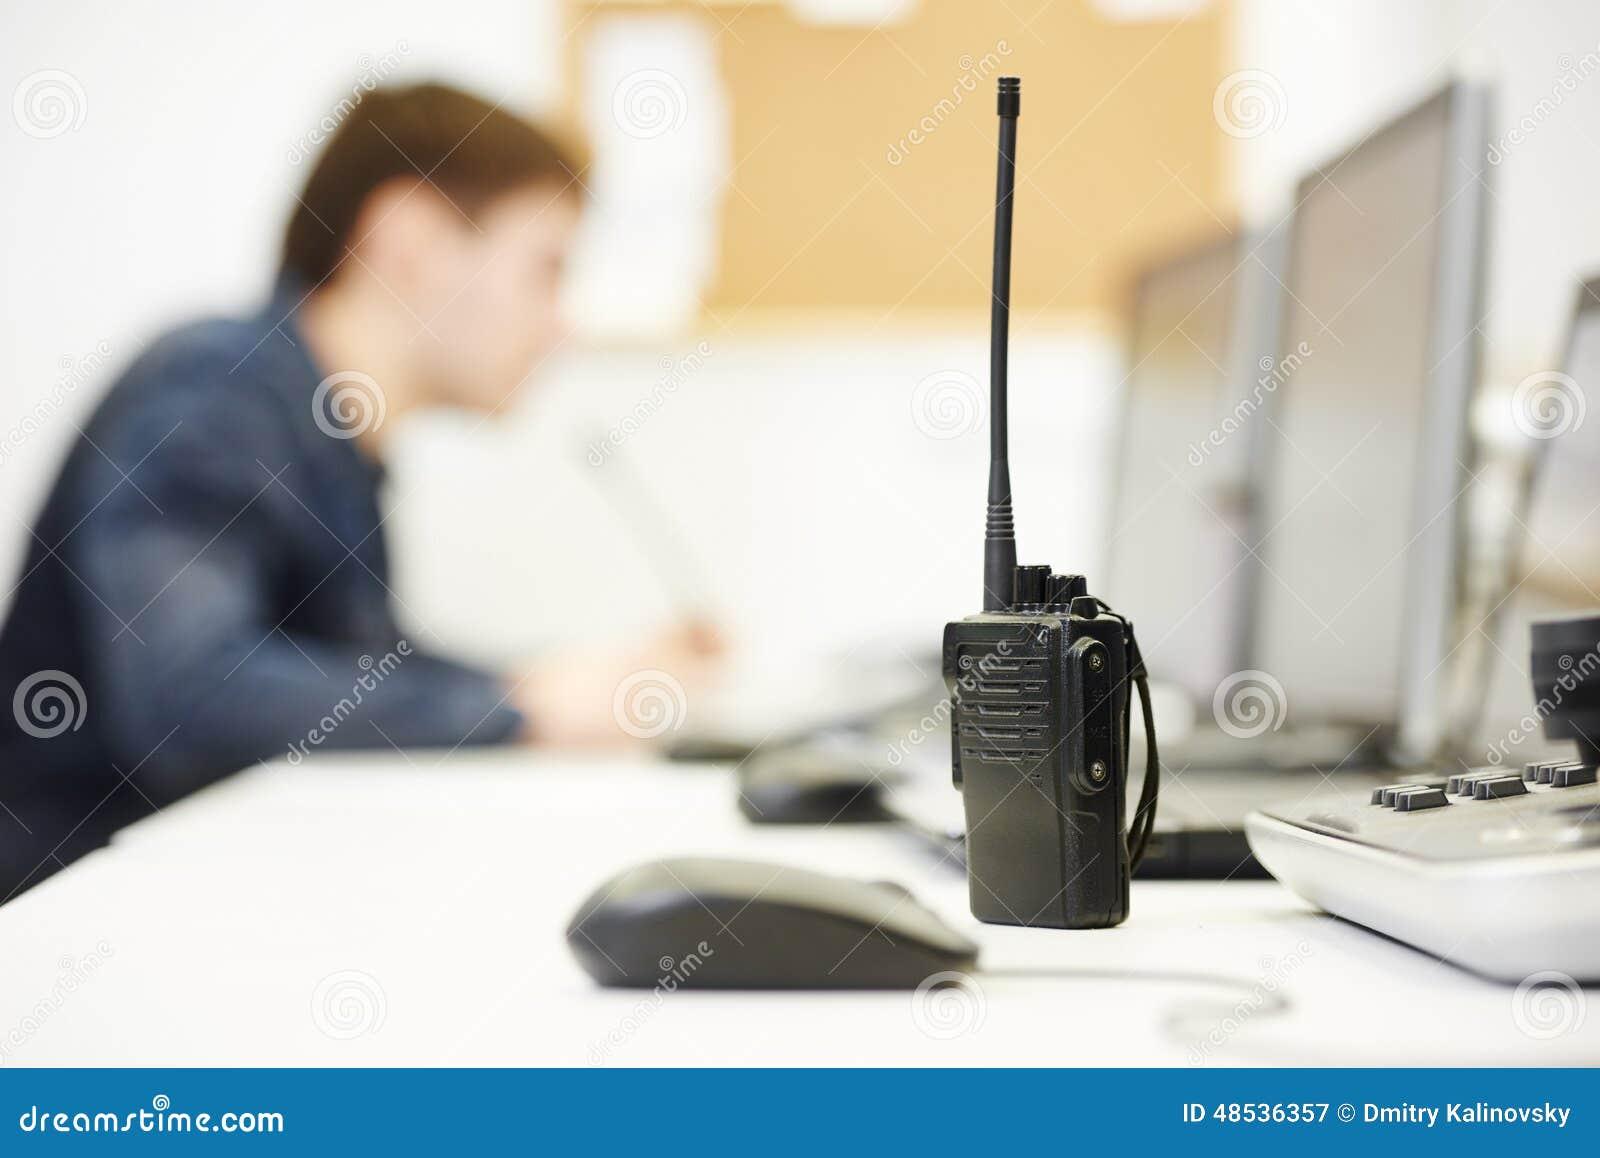 Security video surveillance equipment